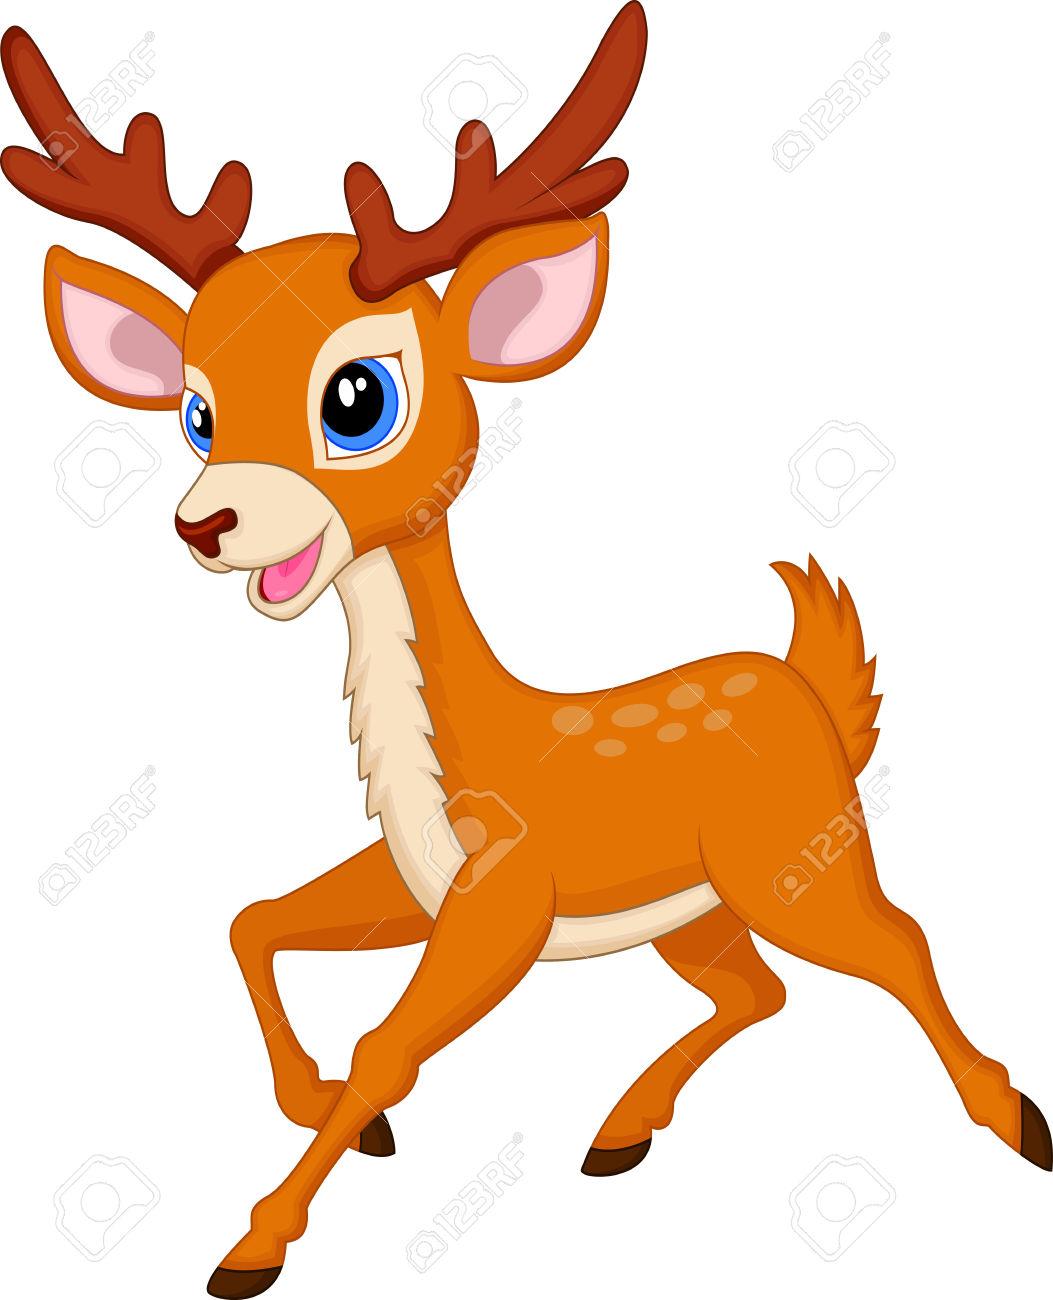 Deer Clip Art - Getbellhop